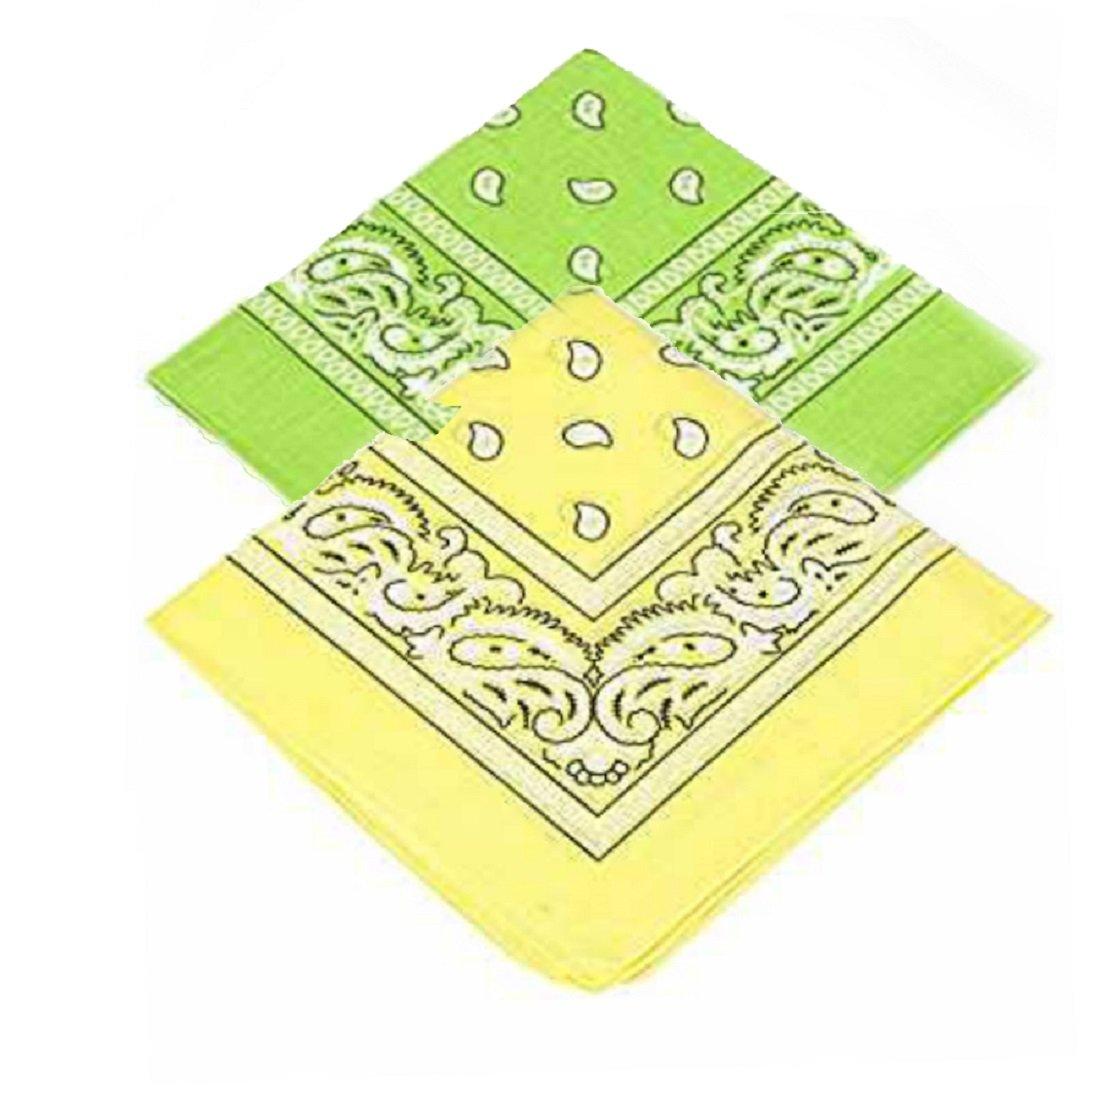 Women /& Kids For Men Set of 2 Paisley Bandanas Light Green /& Yellow Bandannas scarf//Hankerchief//Head tie//Neck Tie//Neckerchief 100/% Cotton High quality Pack of 2